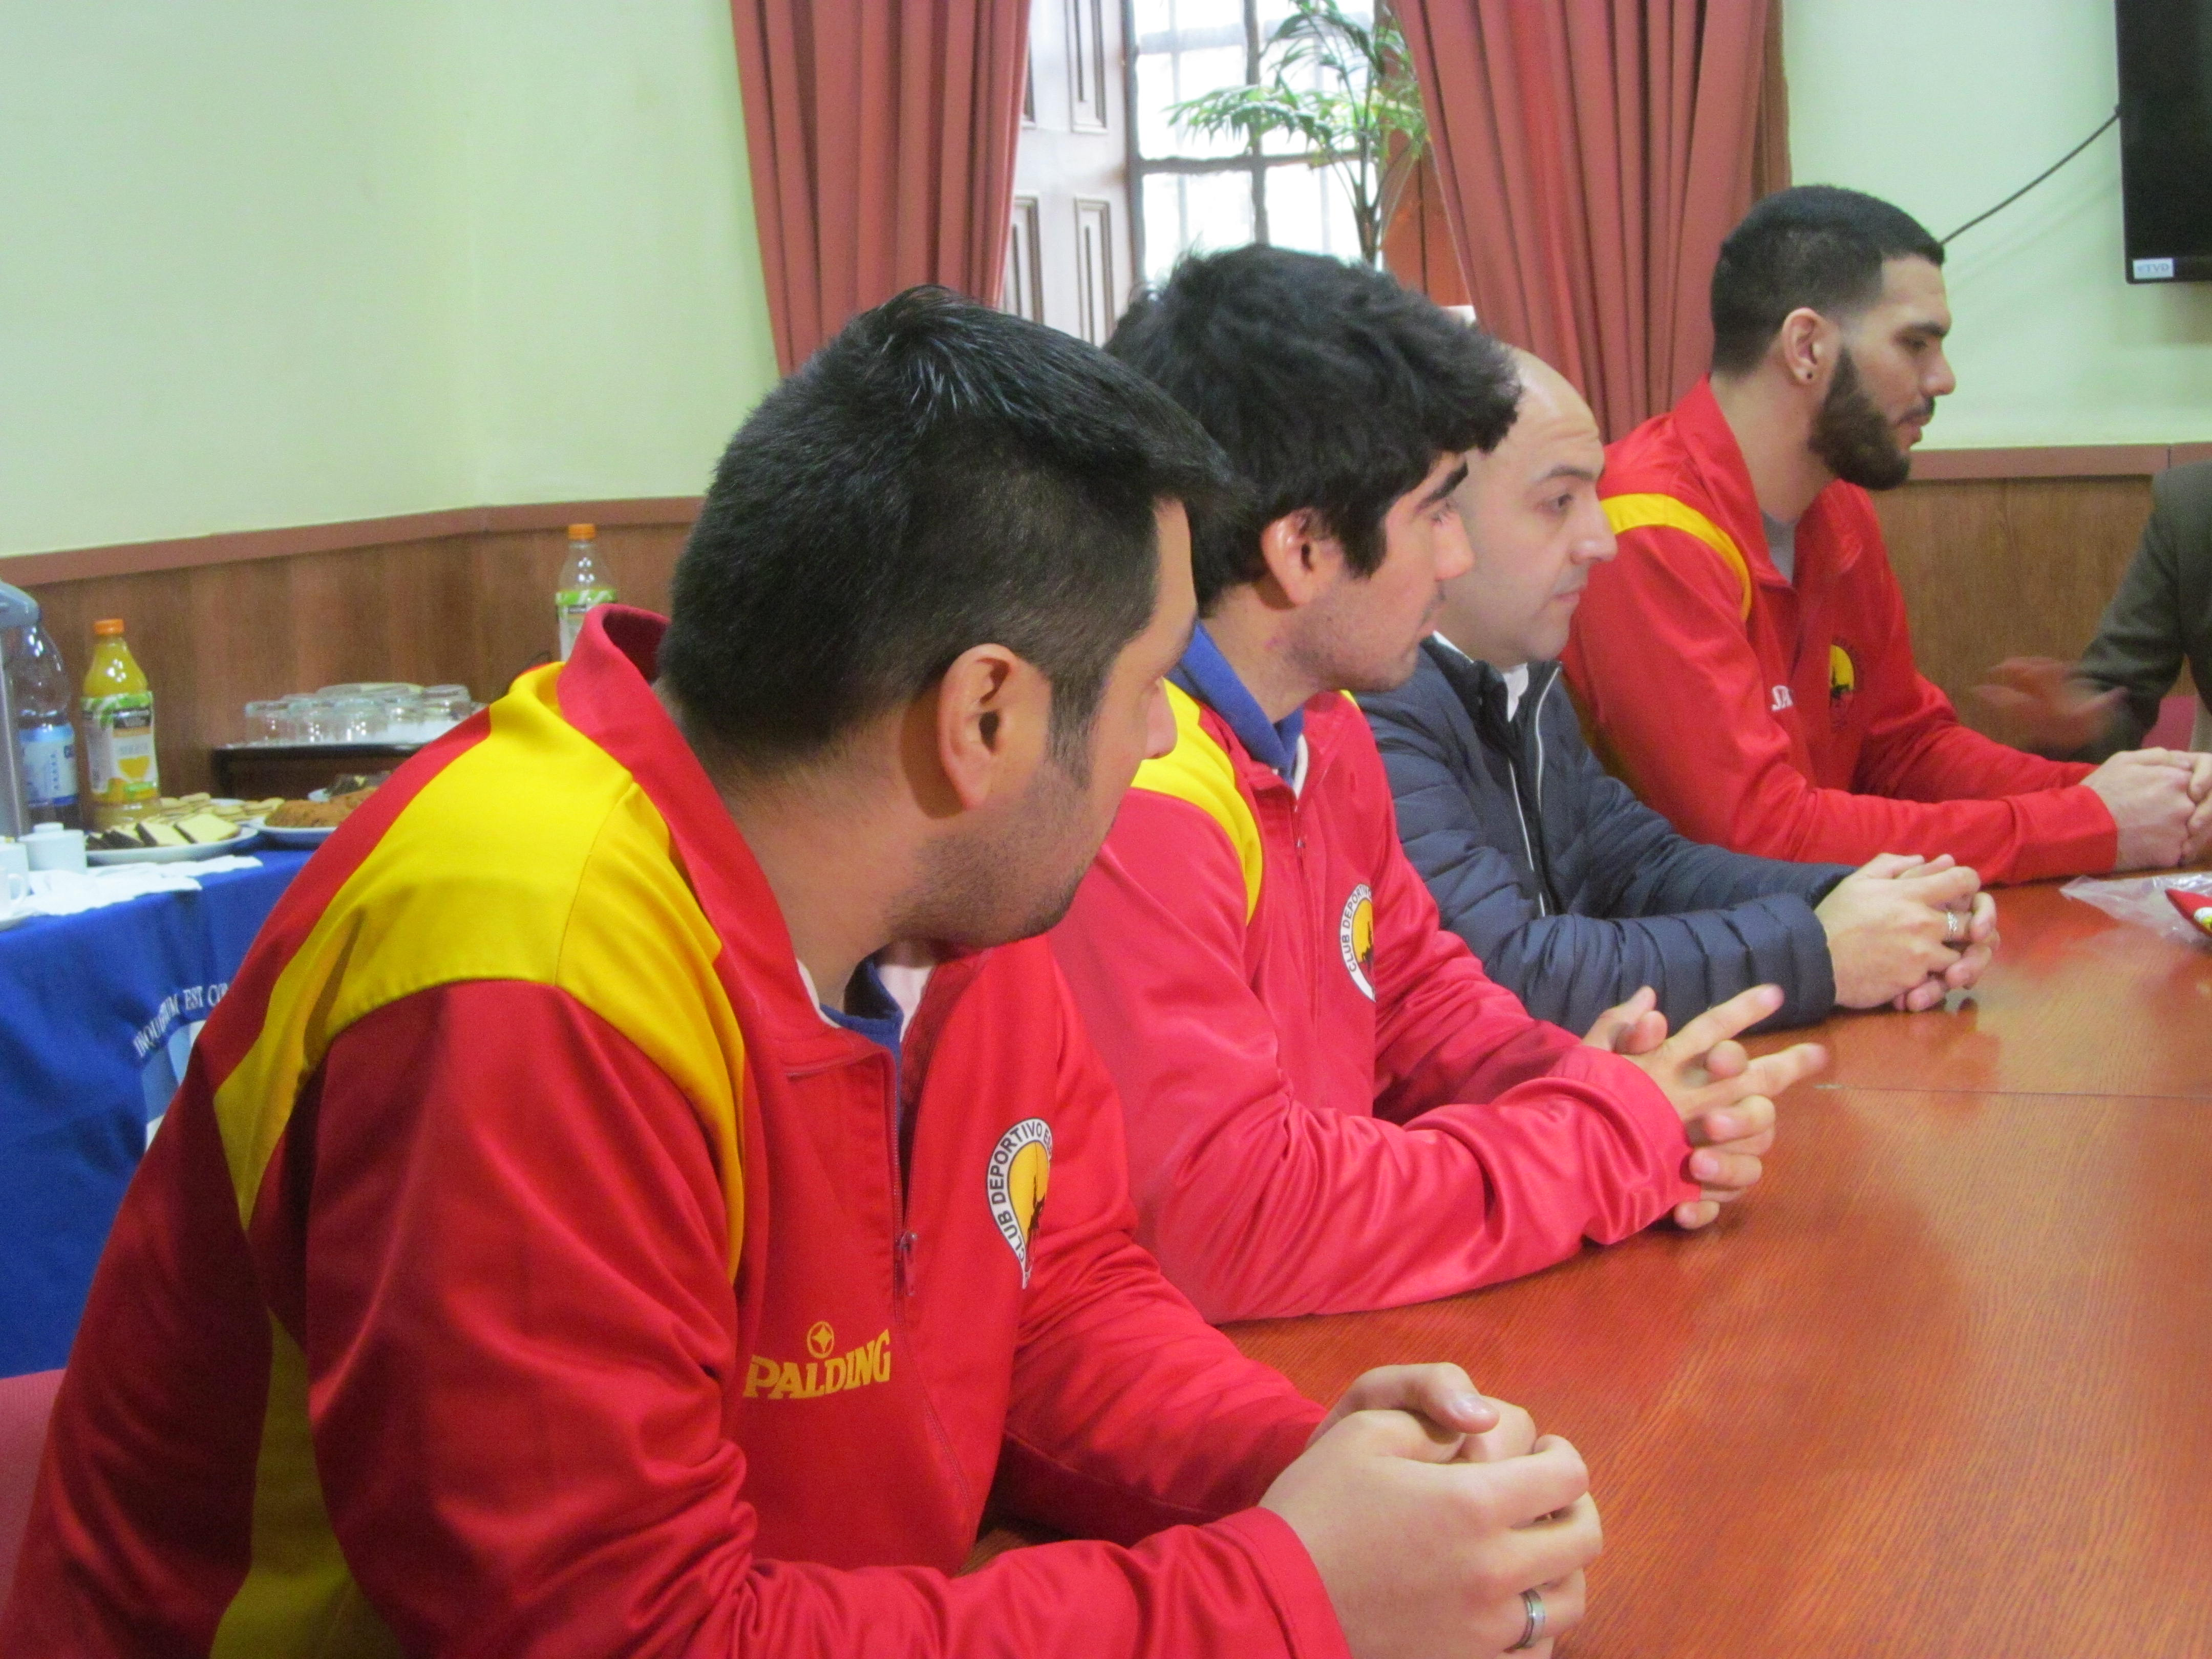 Madera entrega respaldo a Tapia en la banca hispana